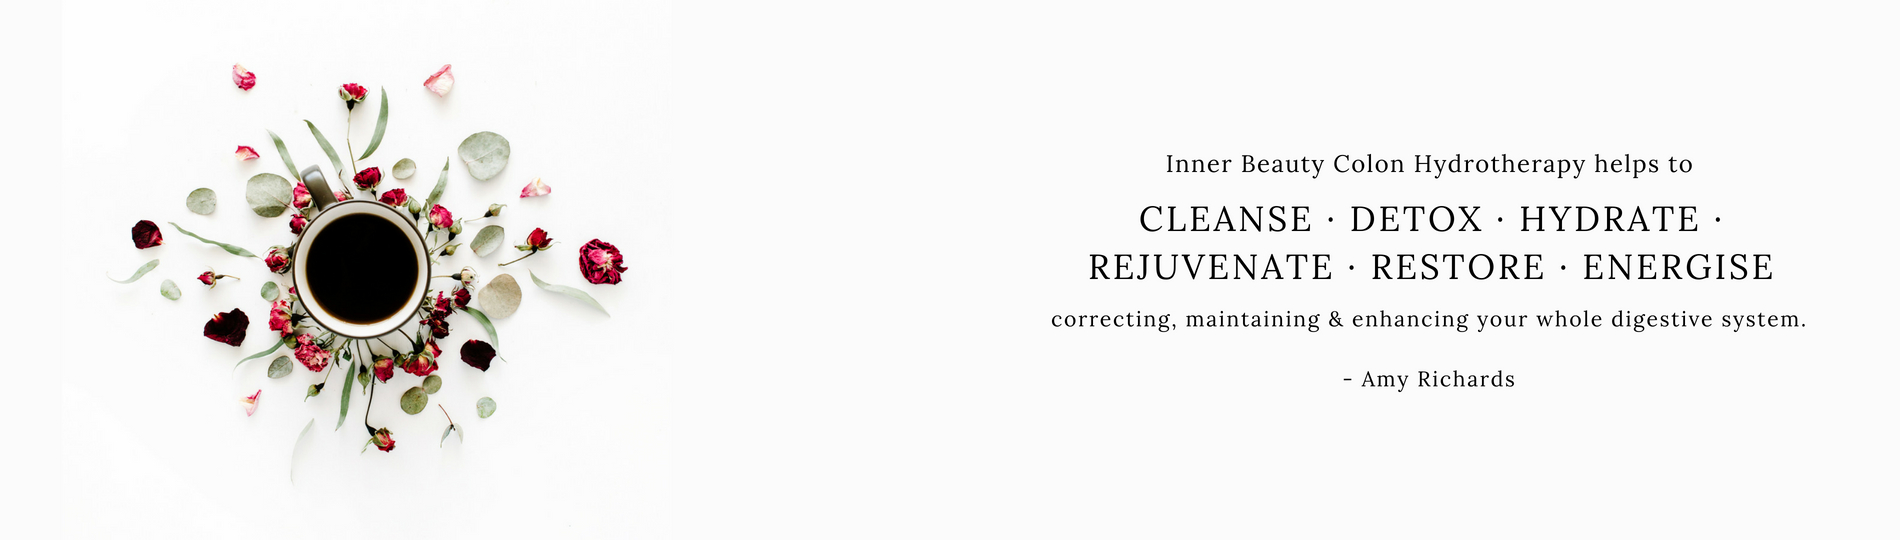 Cleanse · Detox · Hydrate · Rejuvenate · Restore · Energise-2